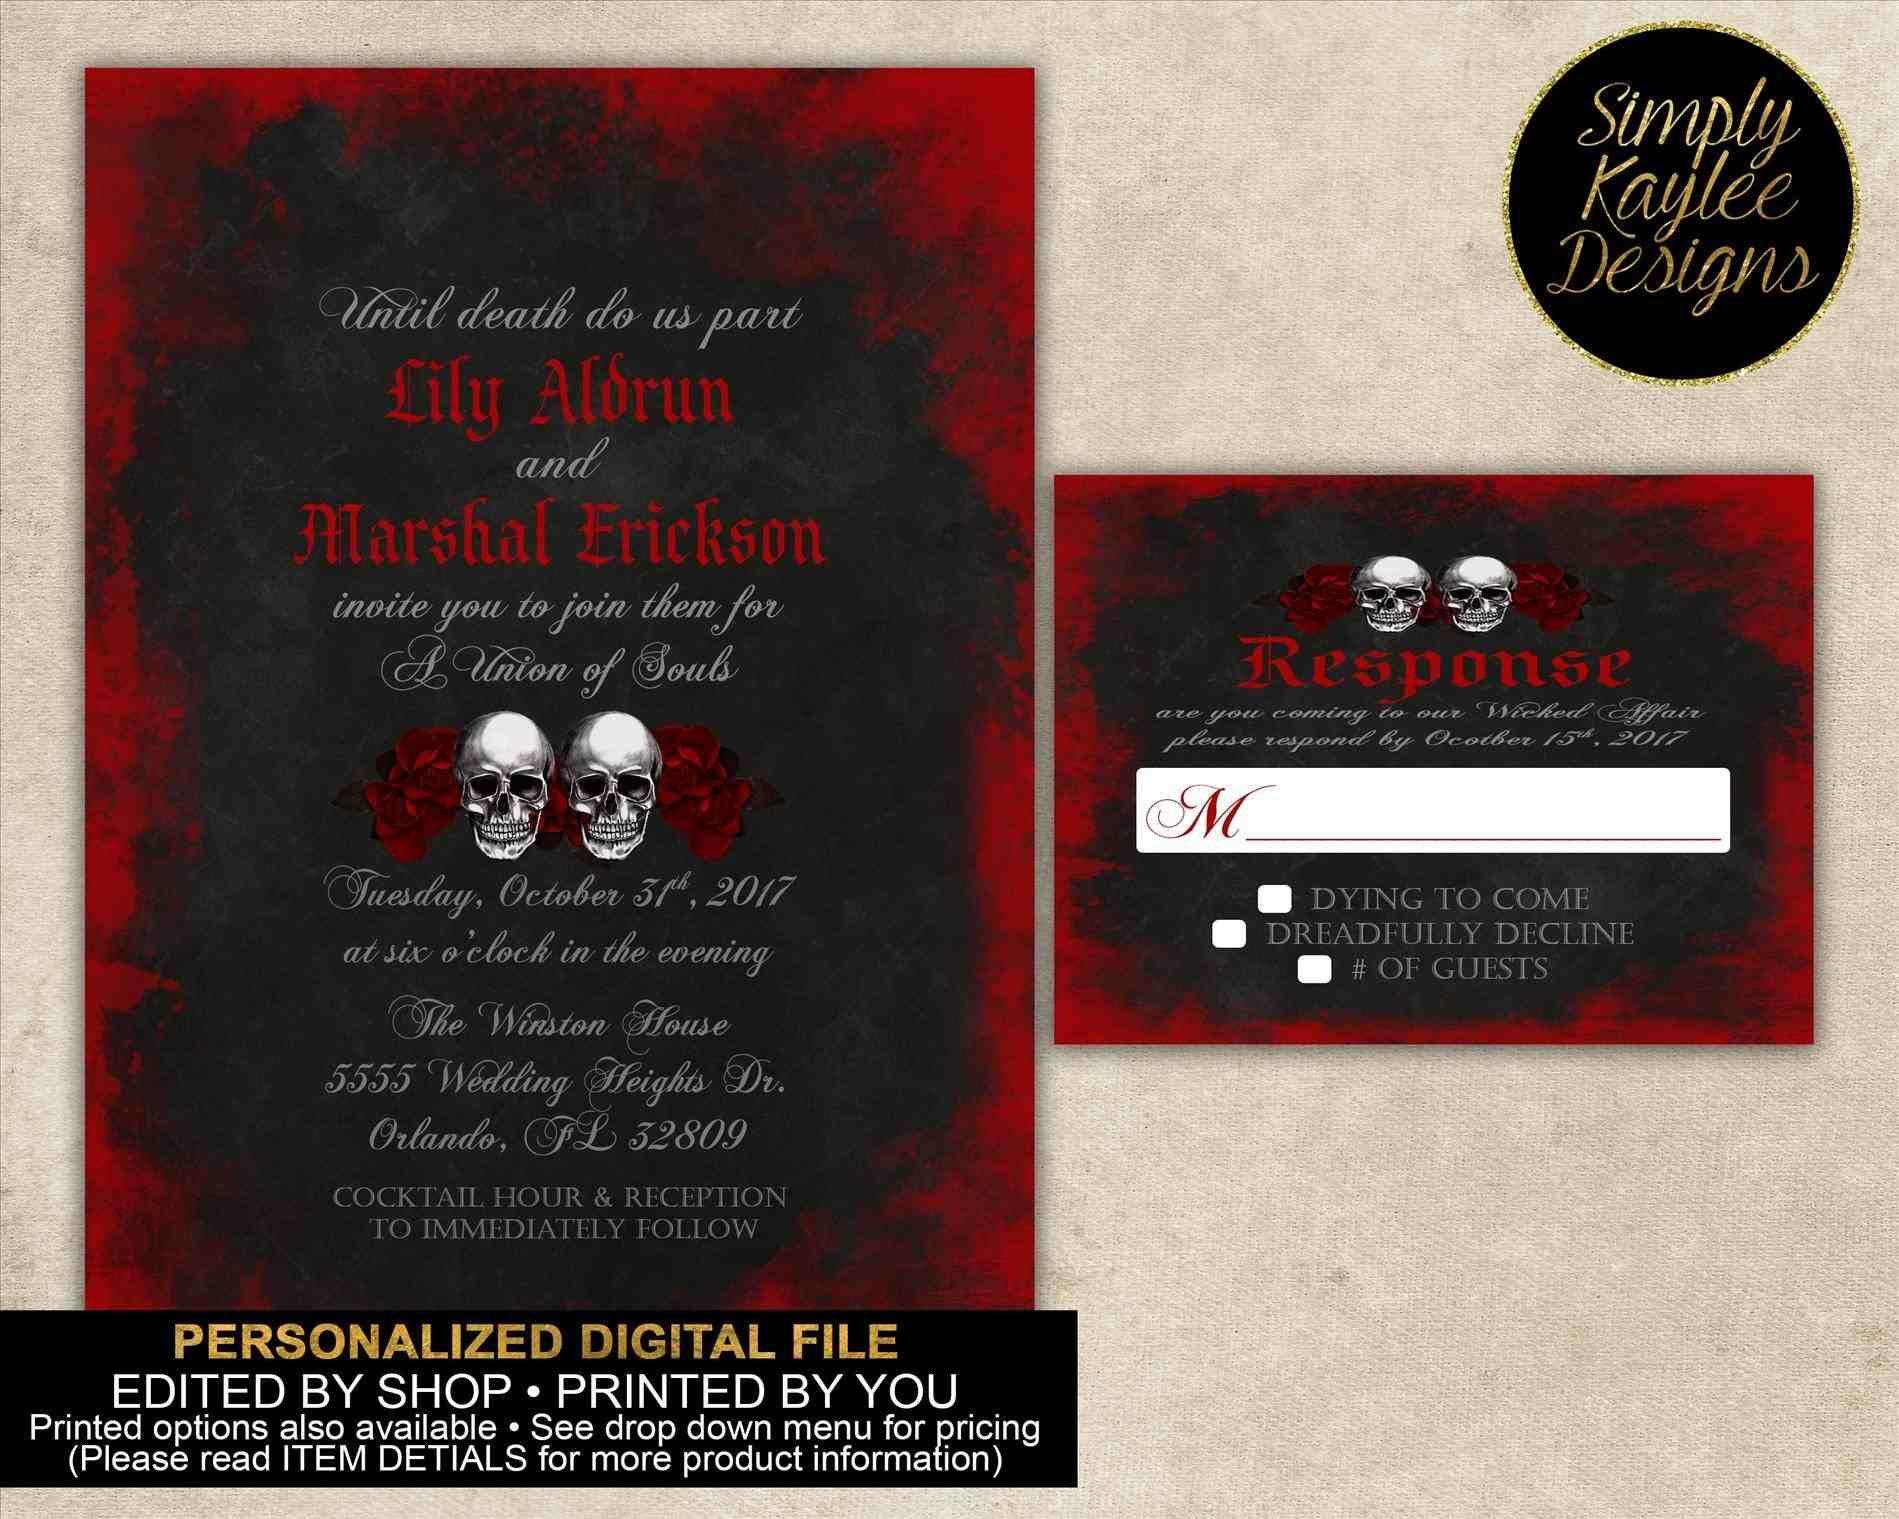 gothic wedding invitations | Weddings | Pinterest | Gothic wedding ...